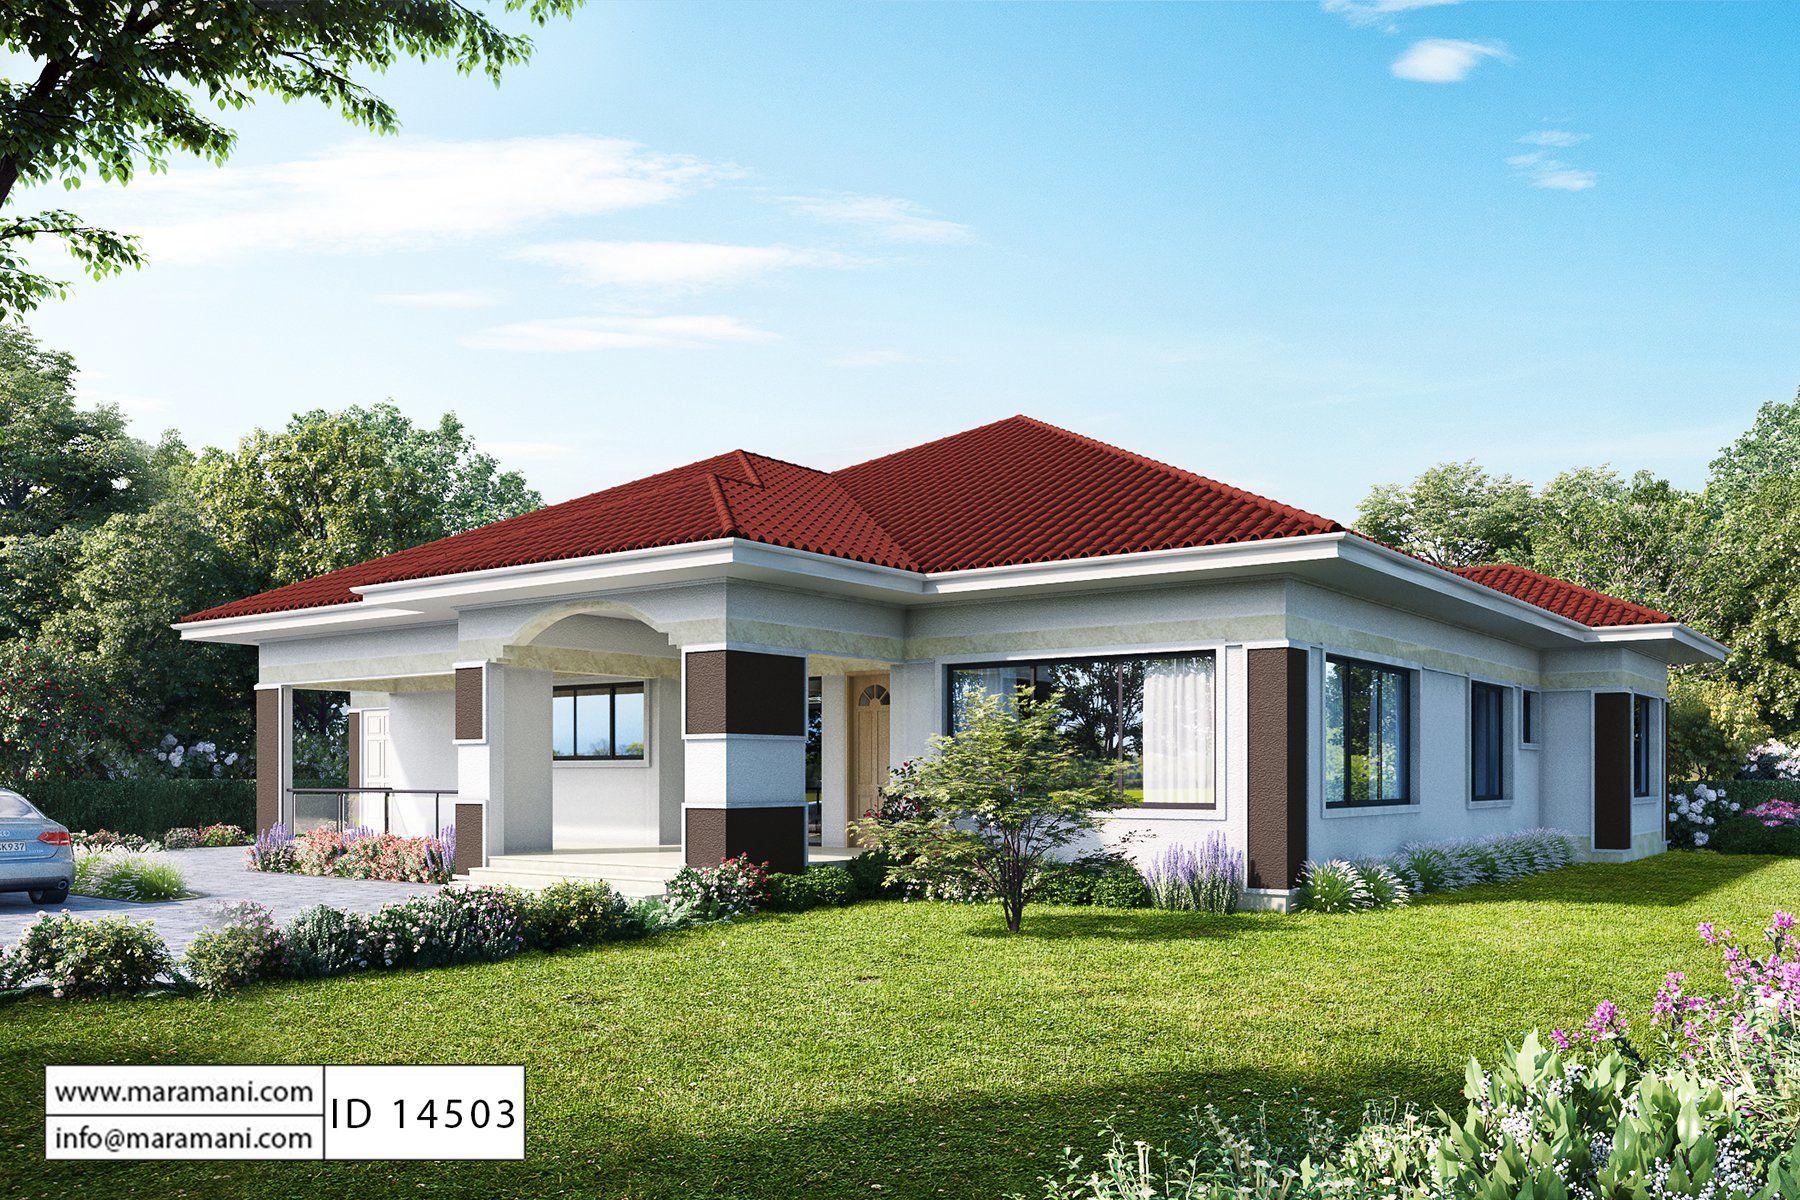 4 Room House Plan Id 14503 House Four Bedroom House Plans Bedroom House Plans Modern House Plans